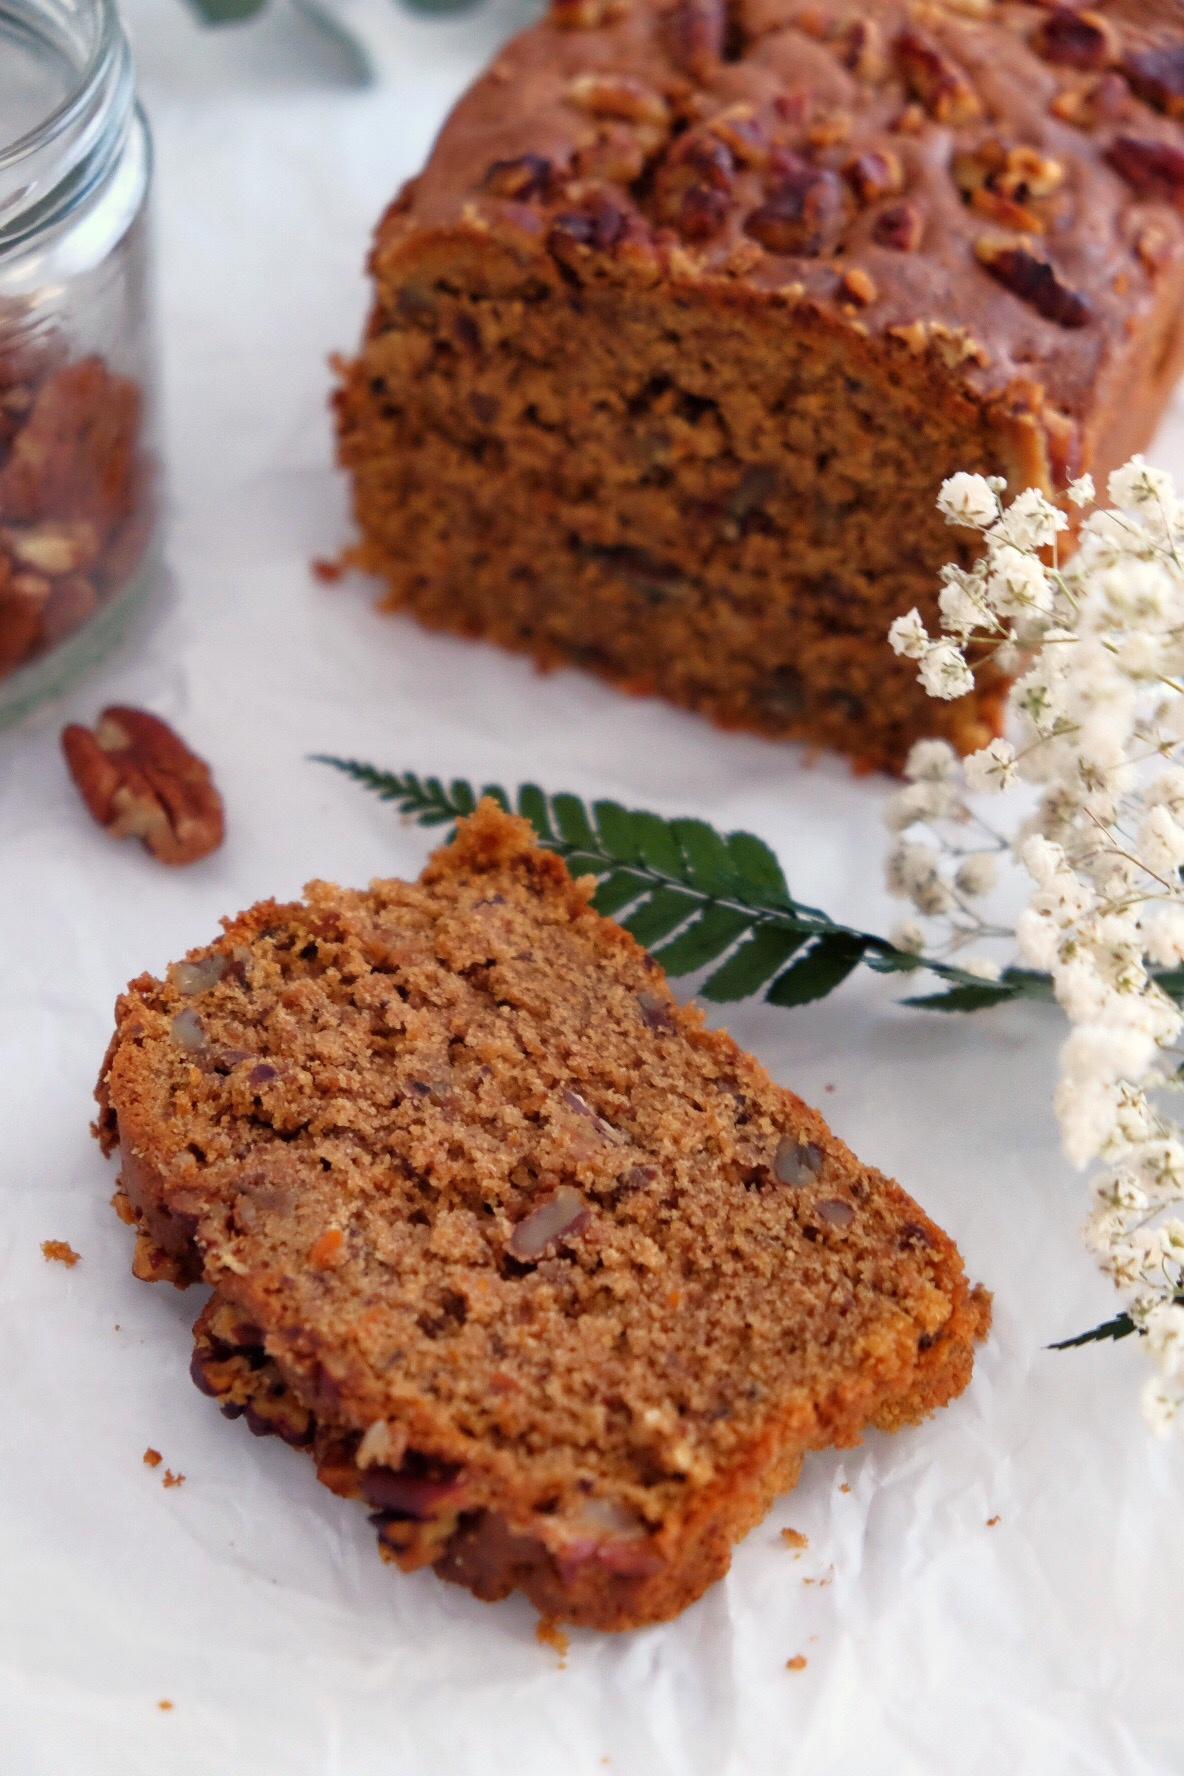 Delicioso pastel de zanahoria sin gluten